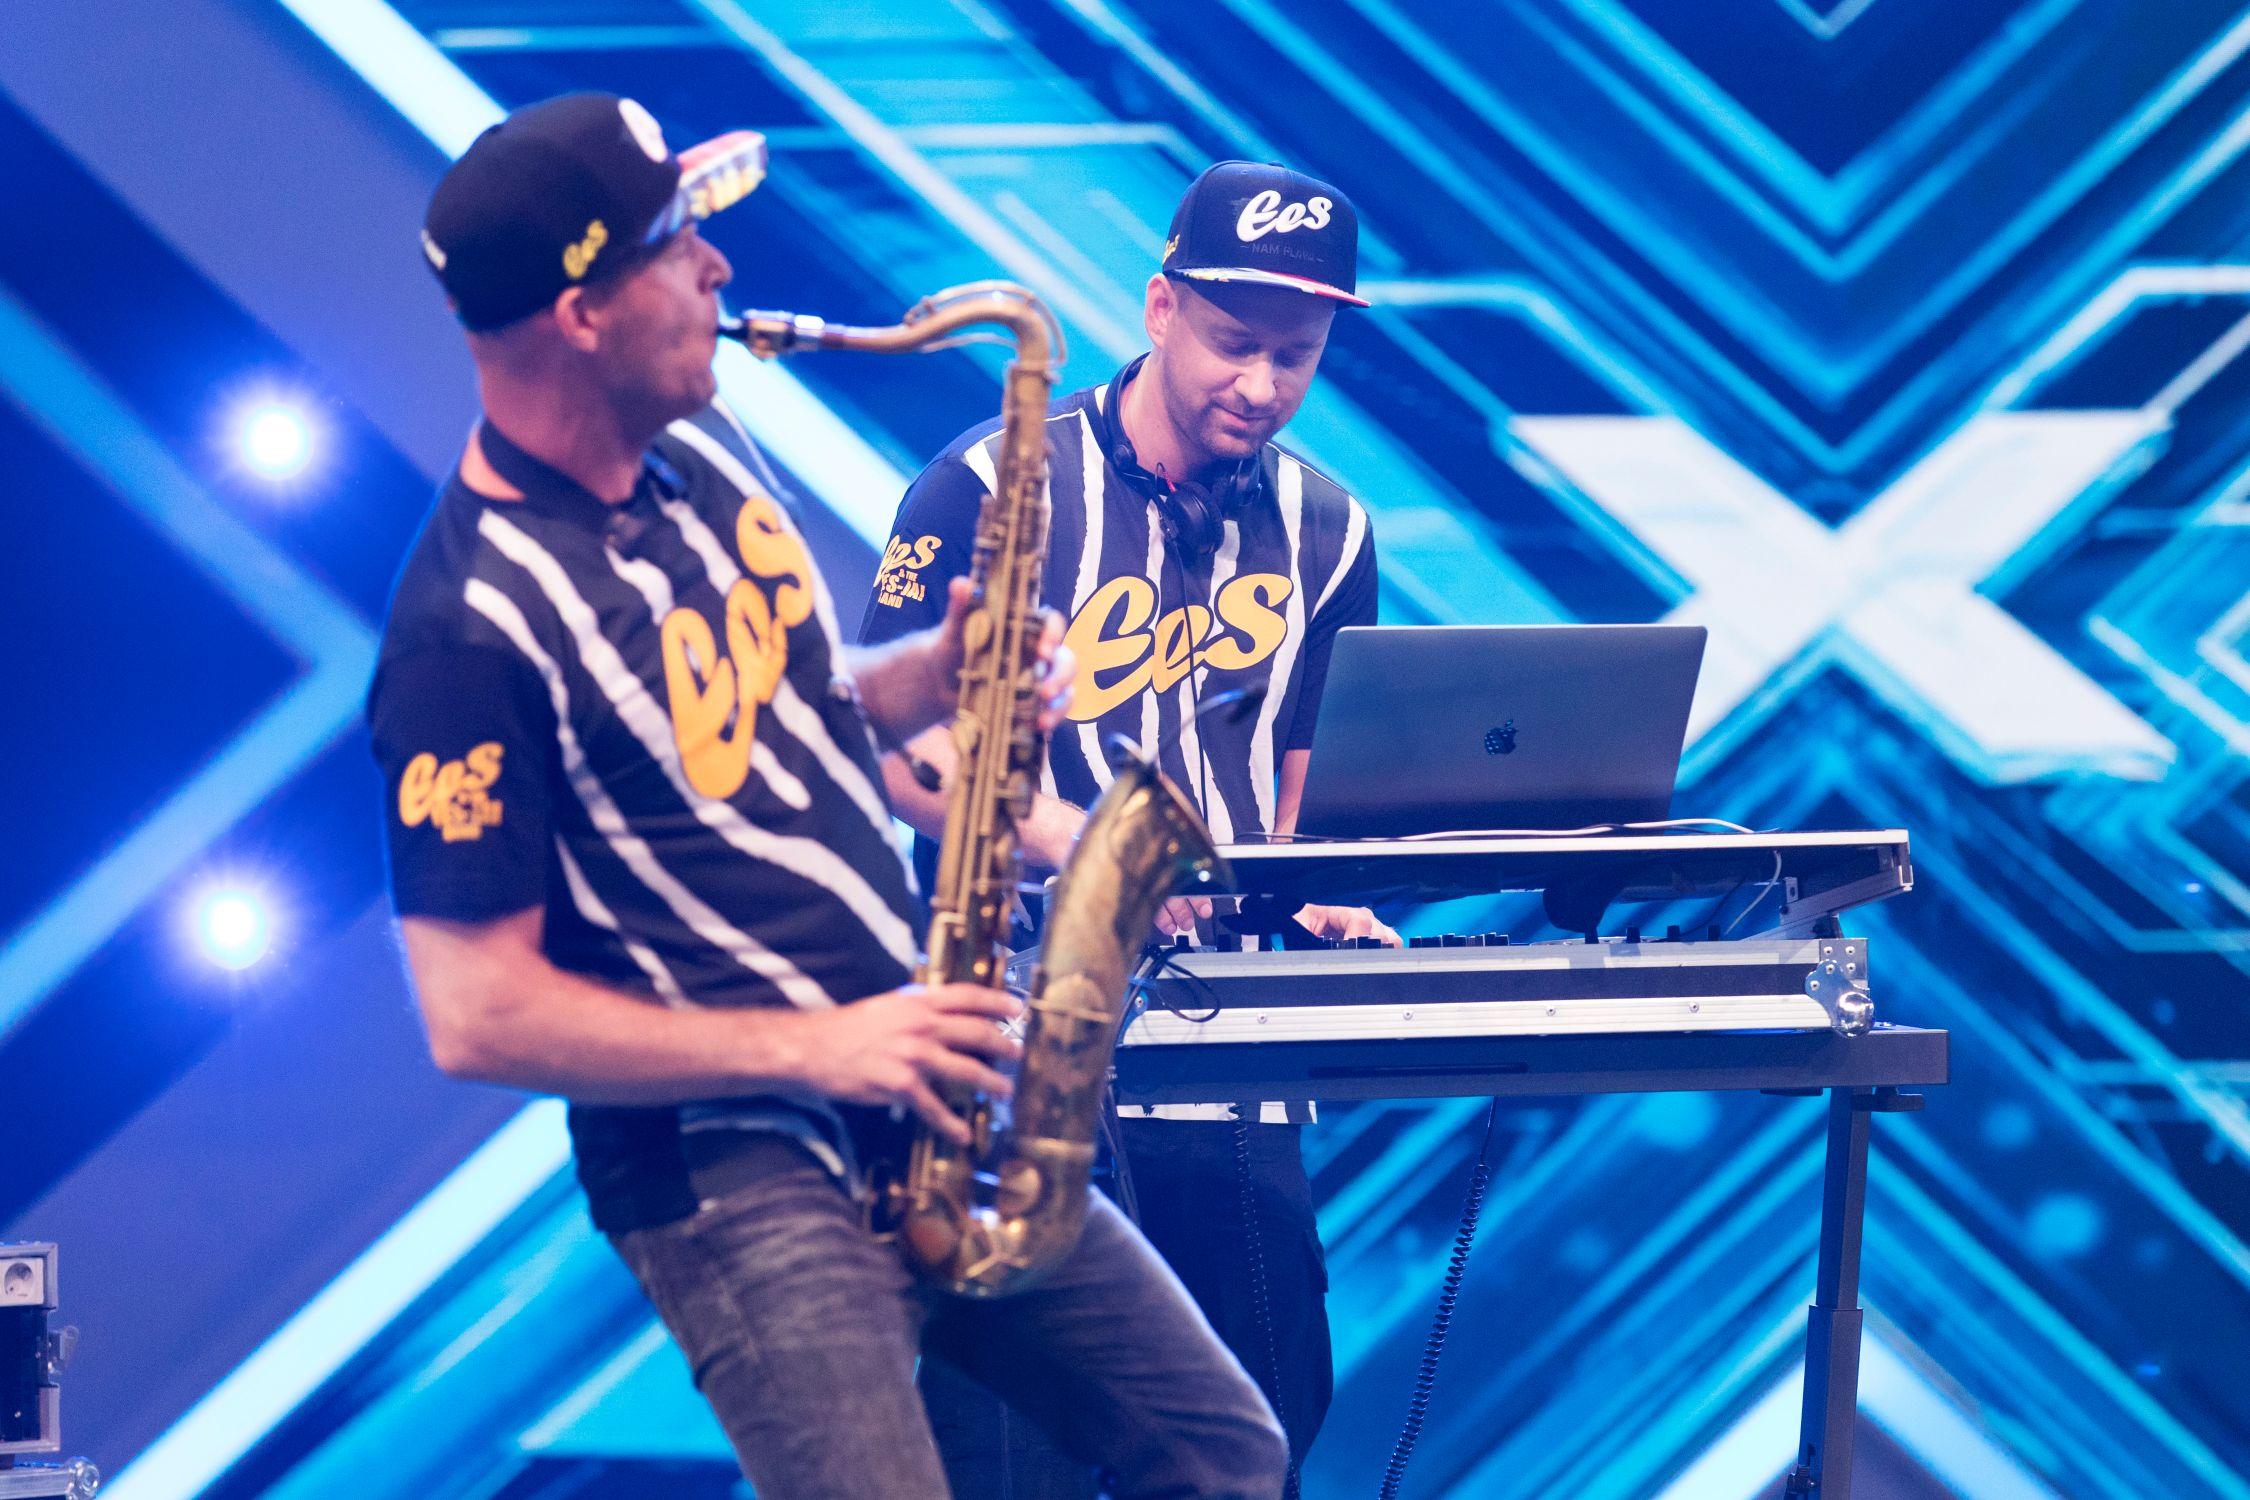 live-band-dj-alex-awesome-x-factor-gewinner-2018.jpg